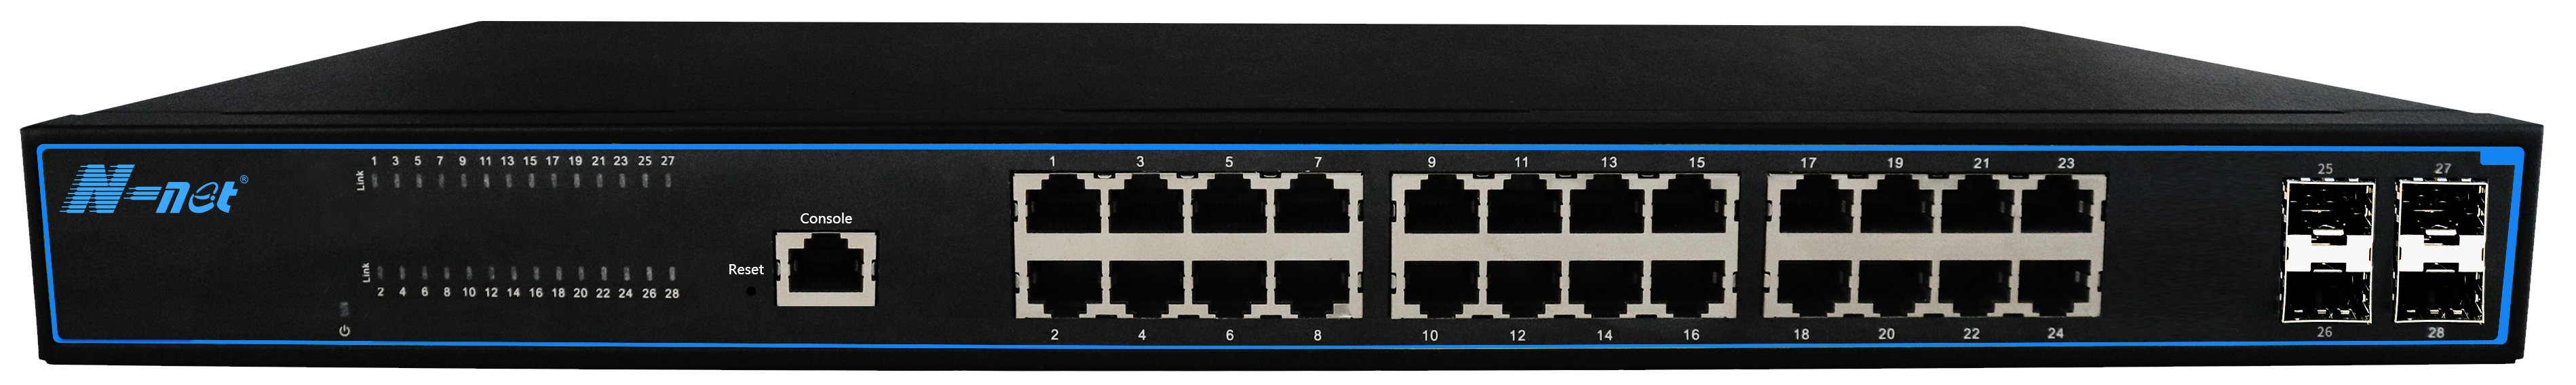 NIE3244GM(4GS)28口全千兆網管型交換機